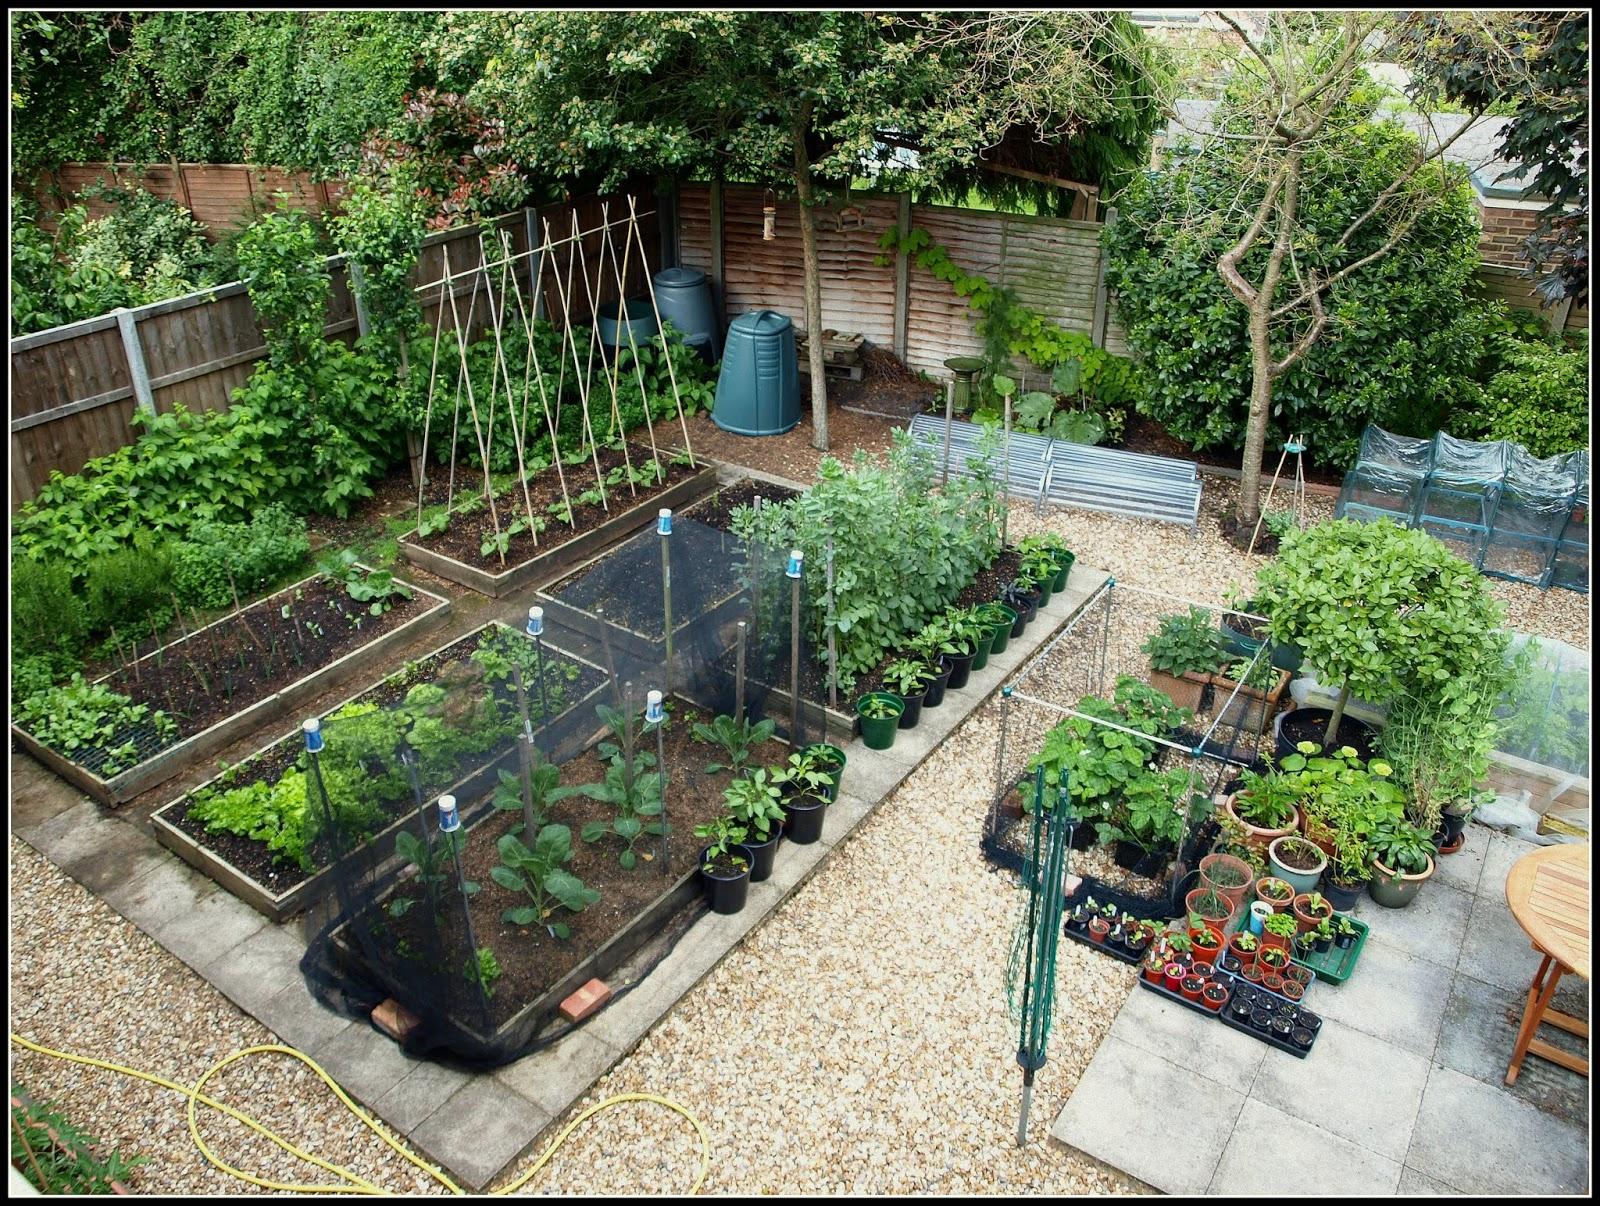 Mark's Veg Plot: My garden plan